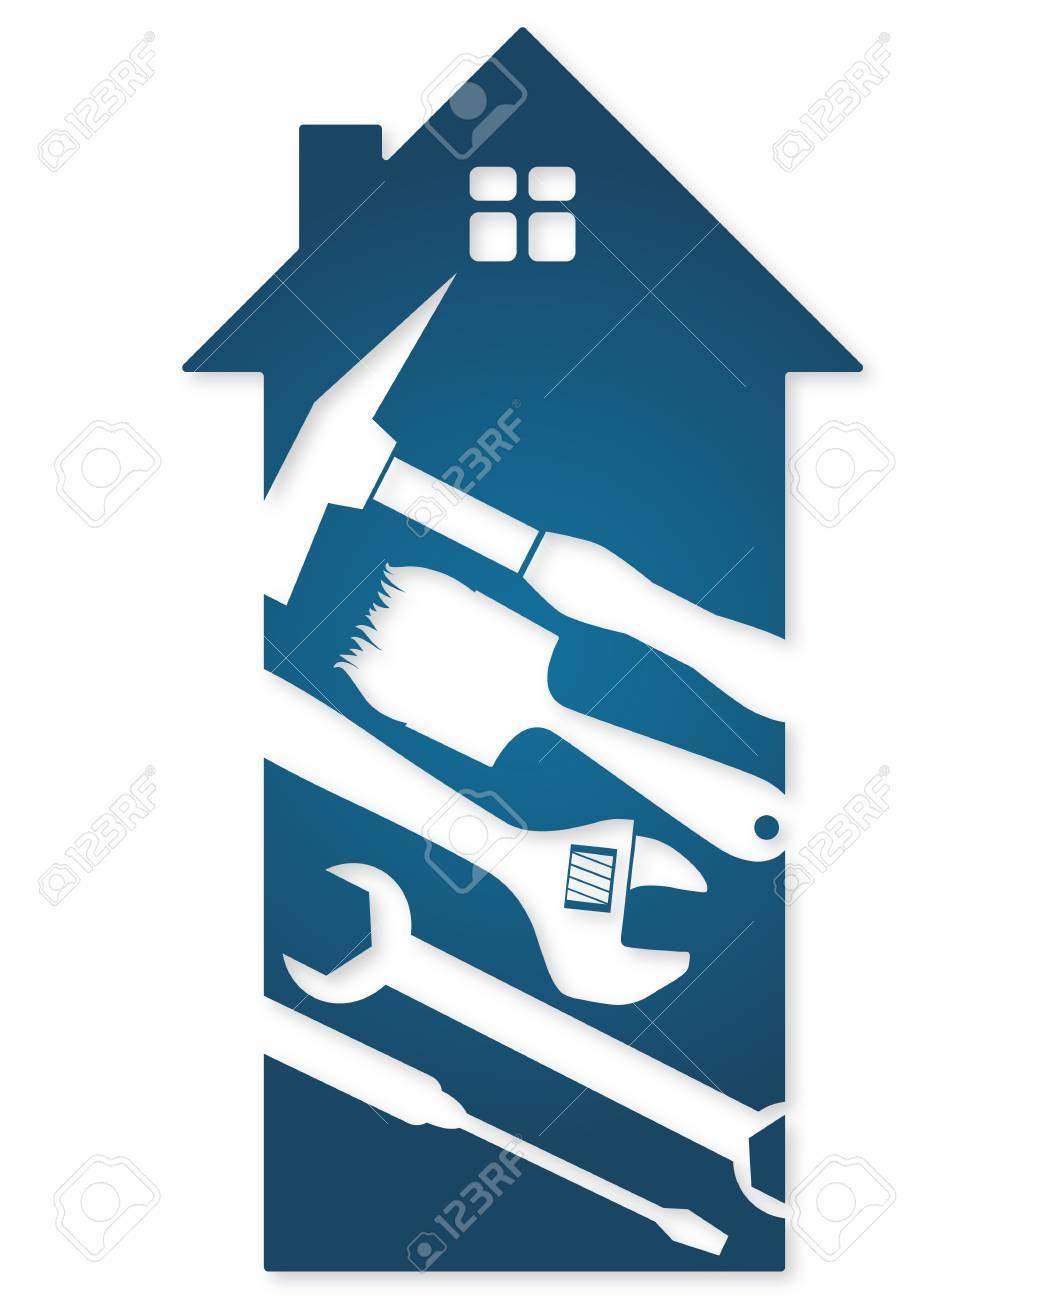 Home repair tools, a symbol of business - 51060725